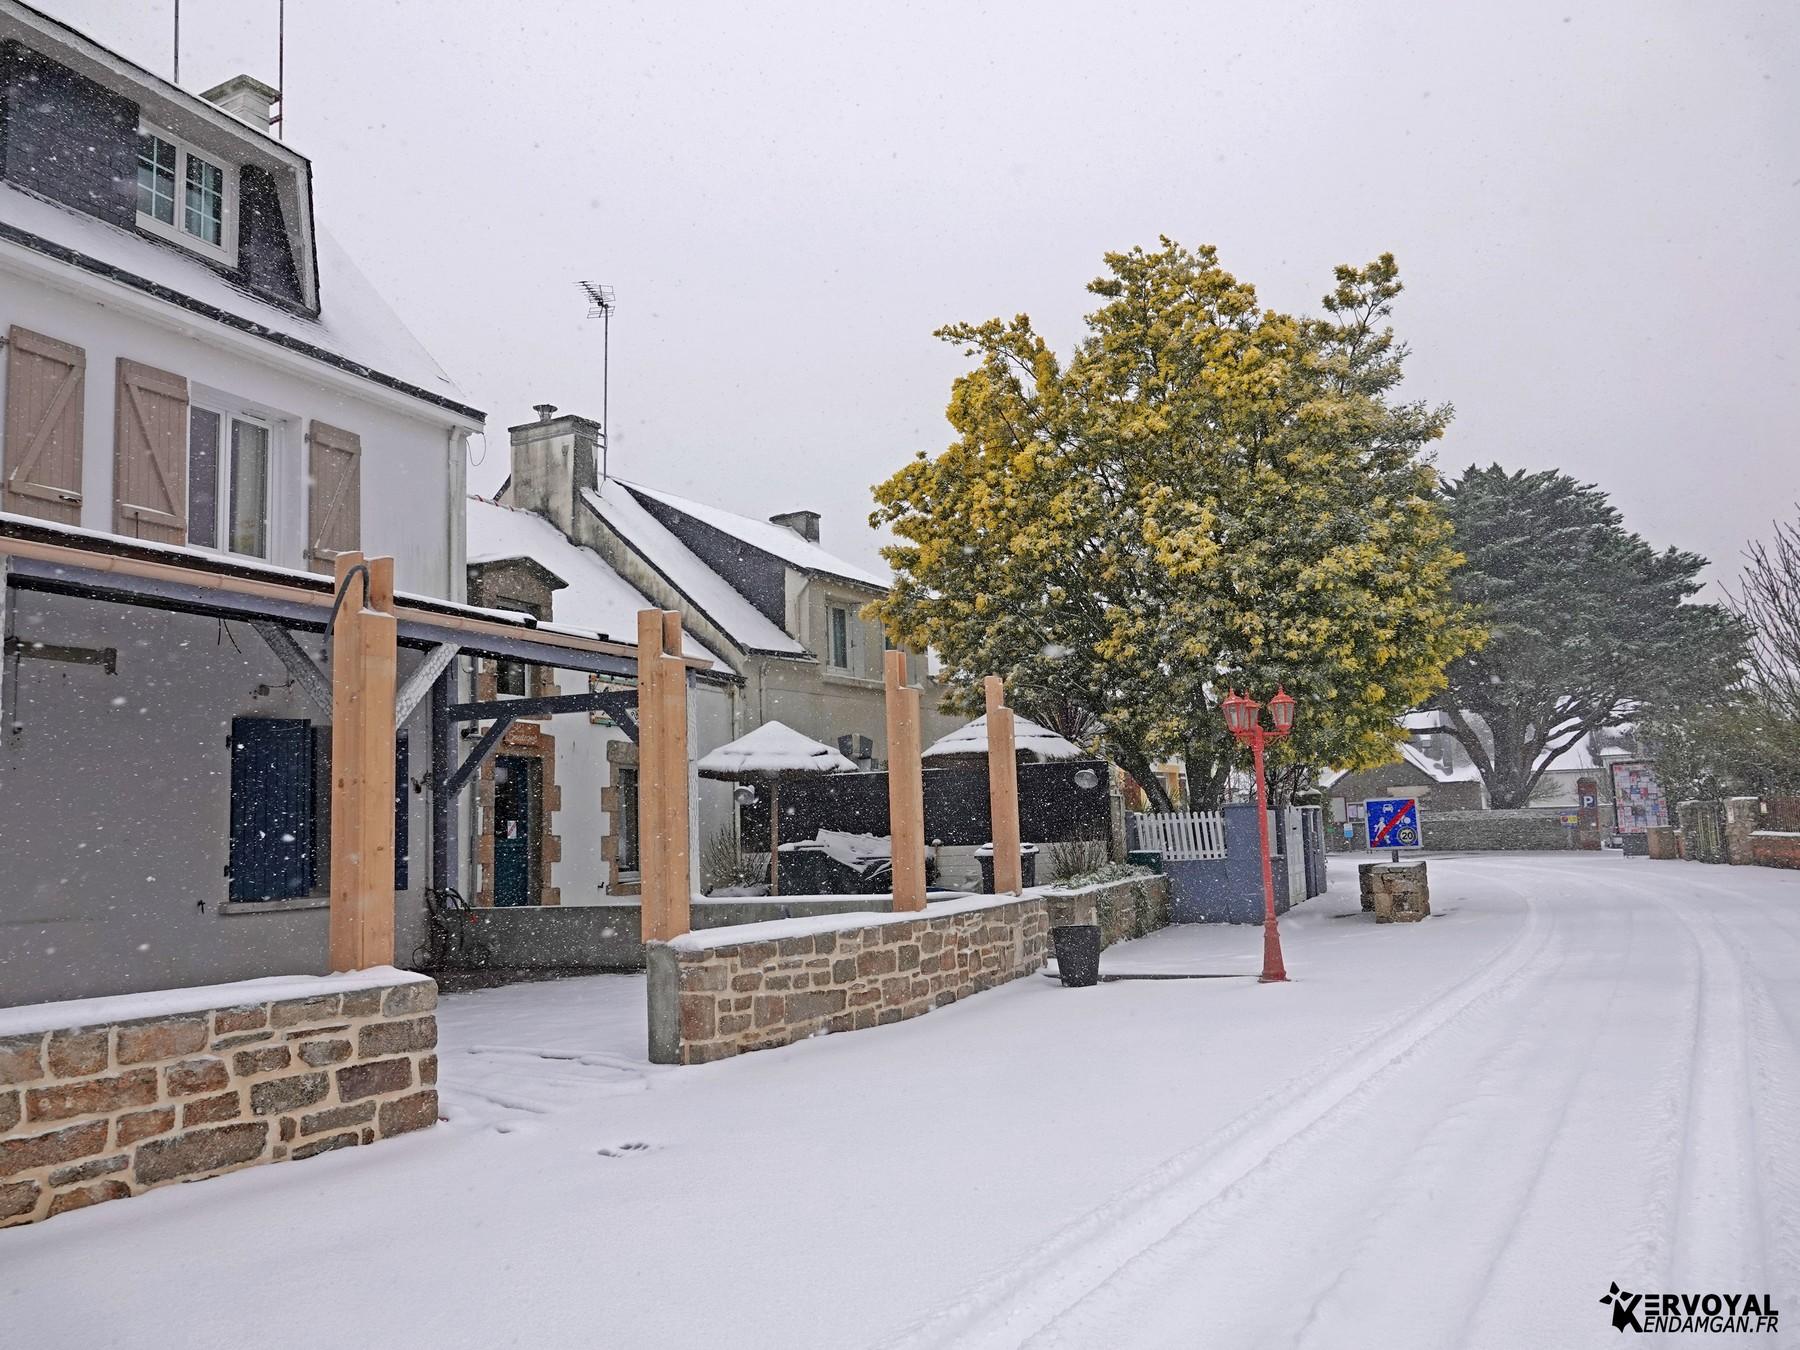 neige à kervoyal 11 février 2021 damgan morbihan (33)